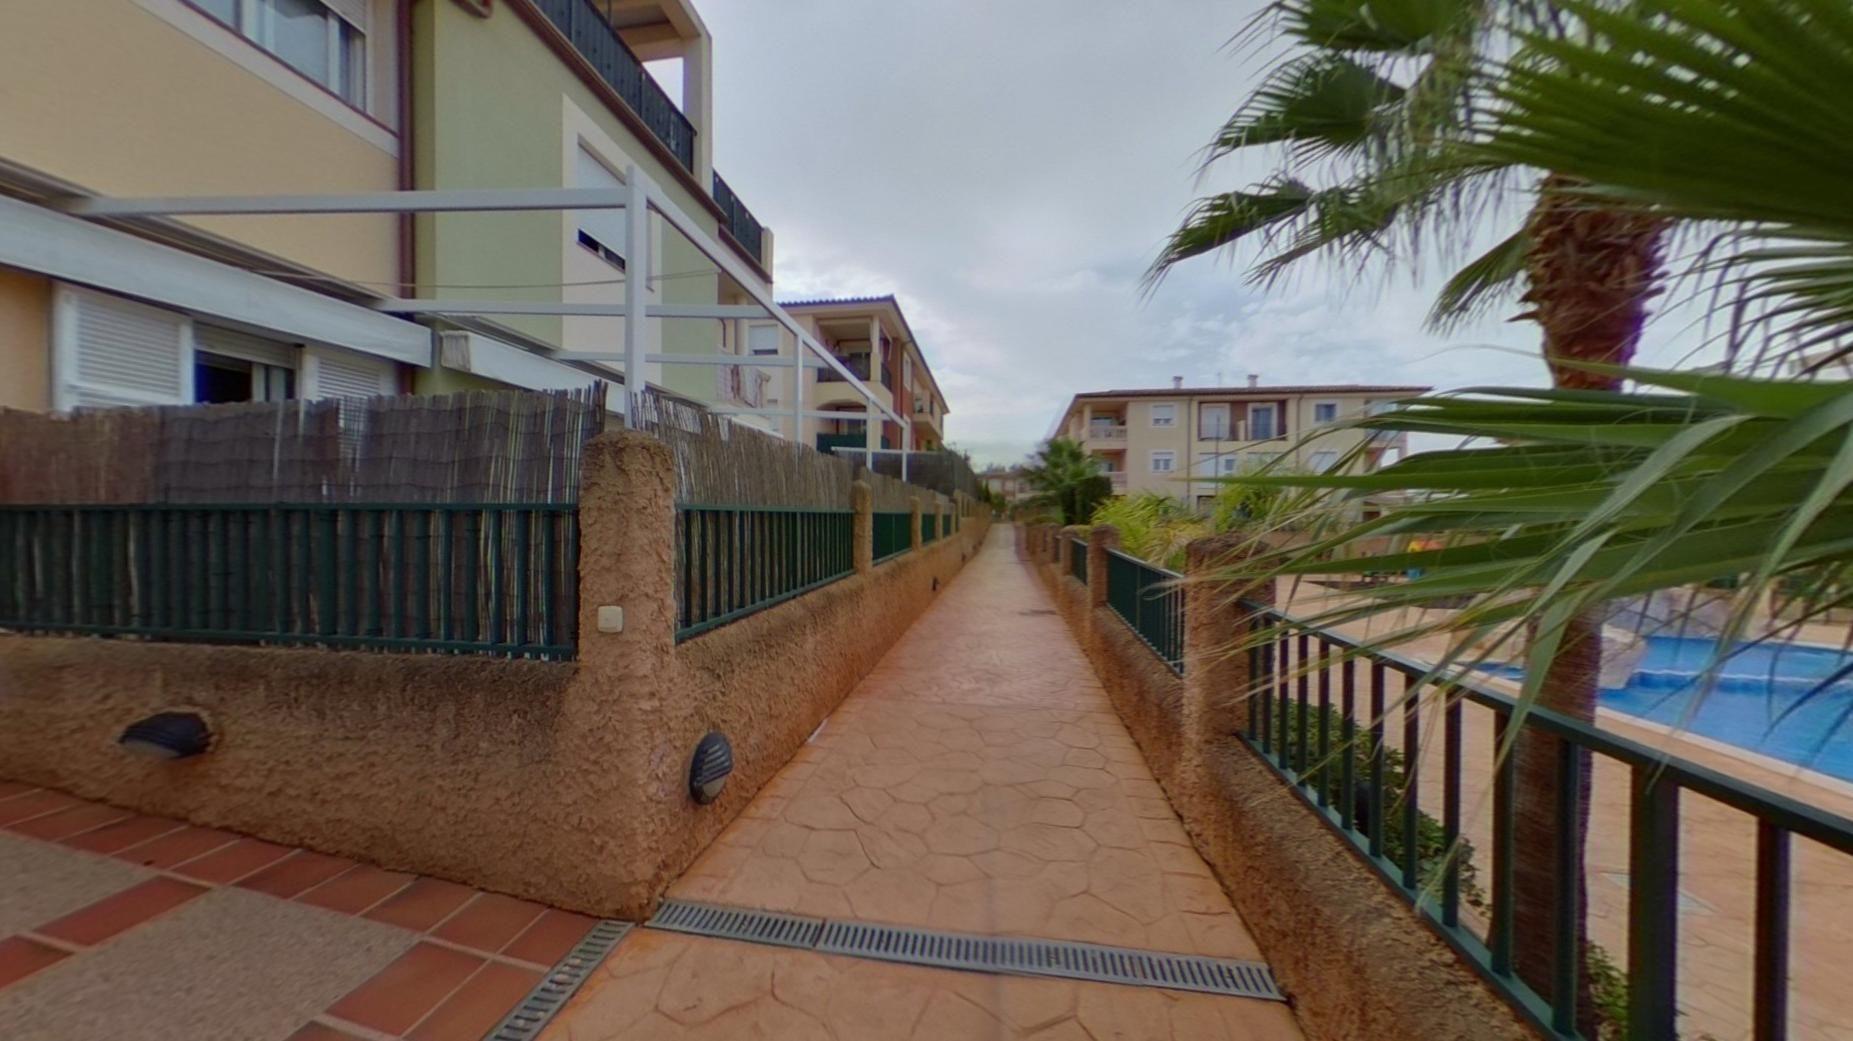 Affitto Appartamento  C/ l´aljub. Solvia inmobiliaria - bajo marratxí